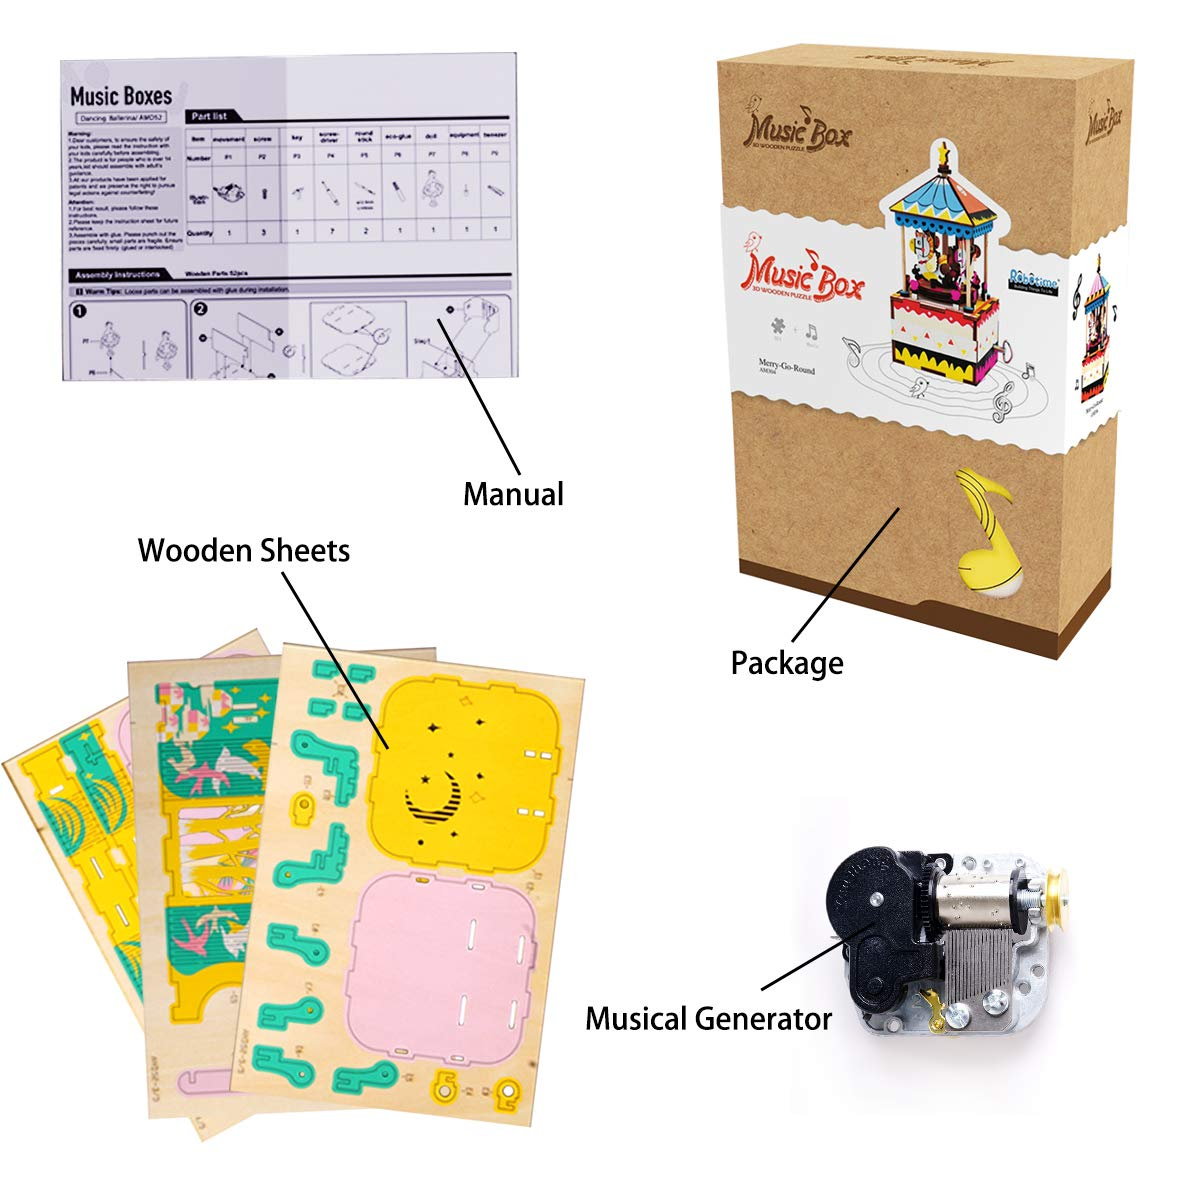 Rolife Hand Crank Music Box Machinarium-DIY Wood Craft Kit-3d Wooden Puzzle-Creative Gift for Boys and Girls When Christmas/Birthday/Valentine's Day (Midsummer Night's Dream)